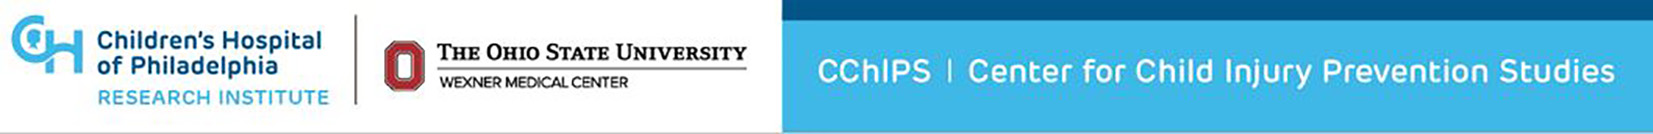 Center for Child Injury Prevention Studies (CChIPS)